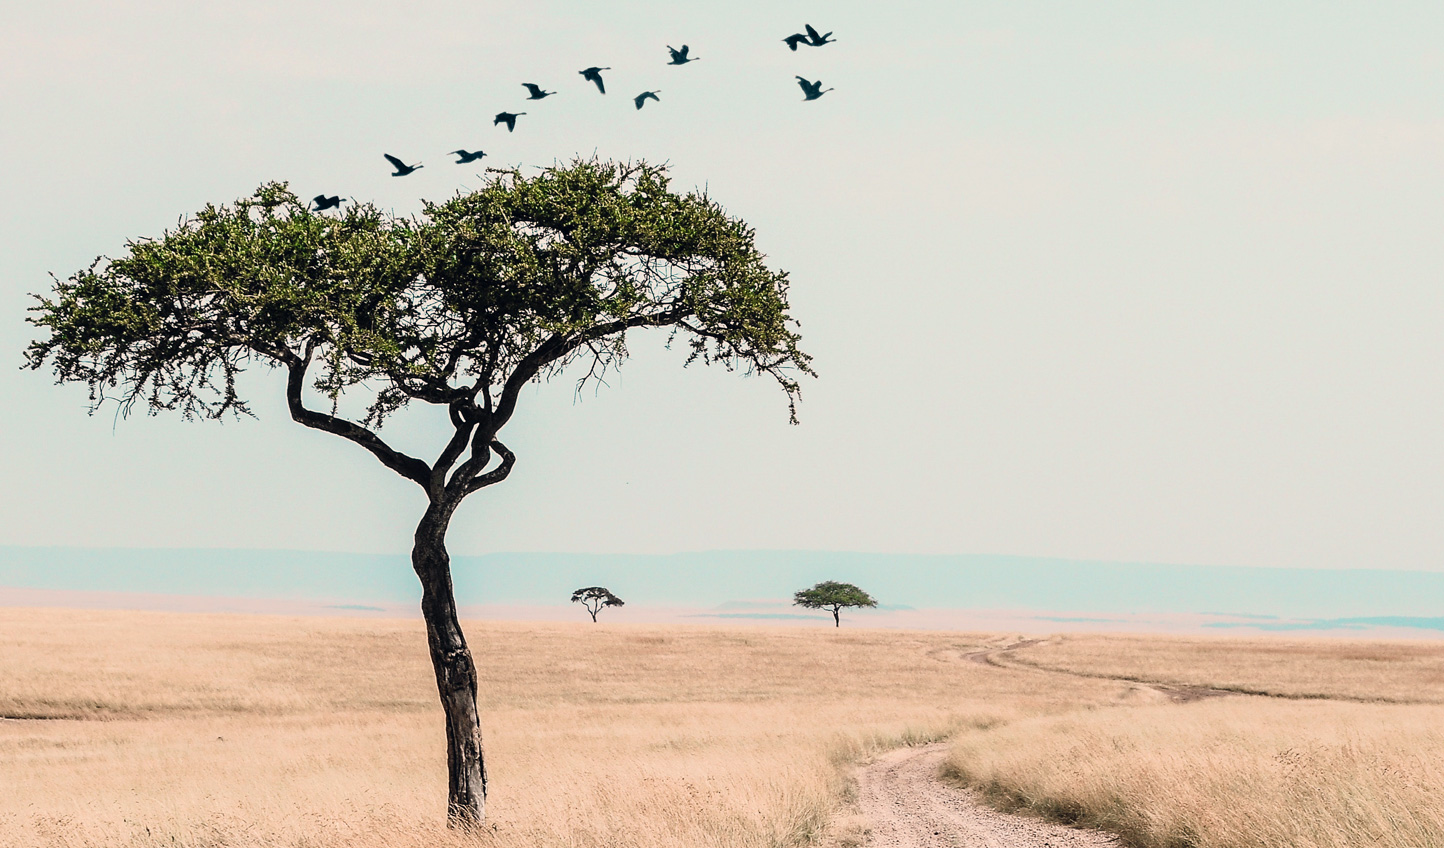 Journey across wide open plains